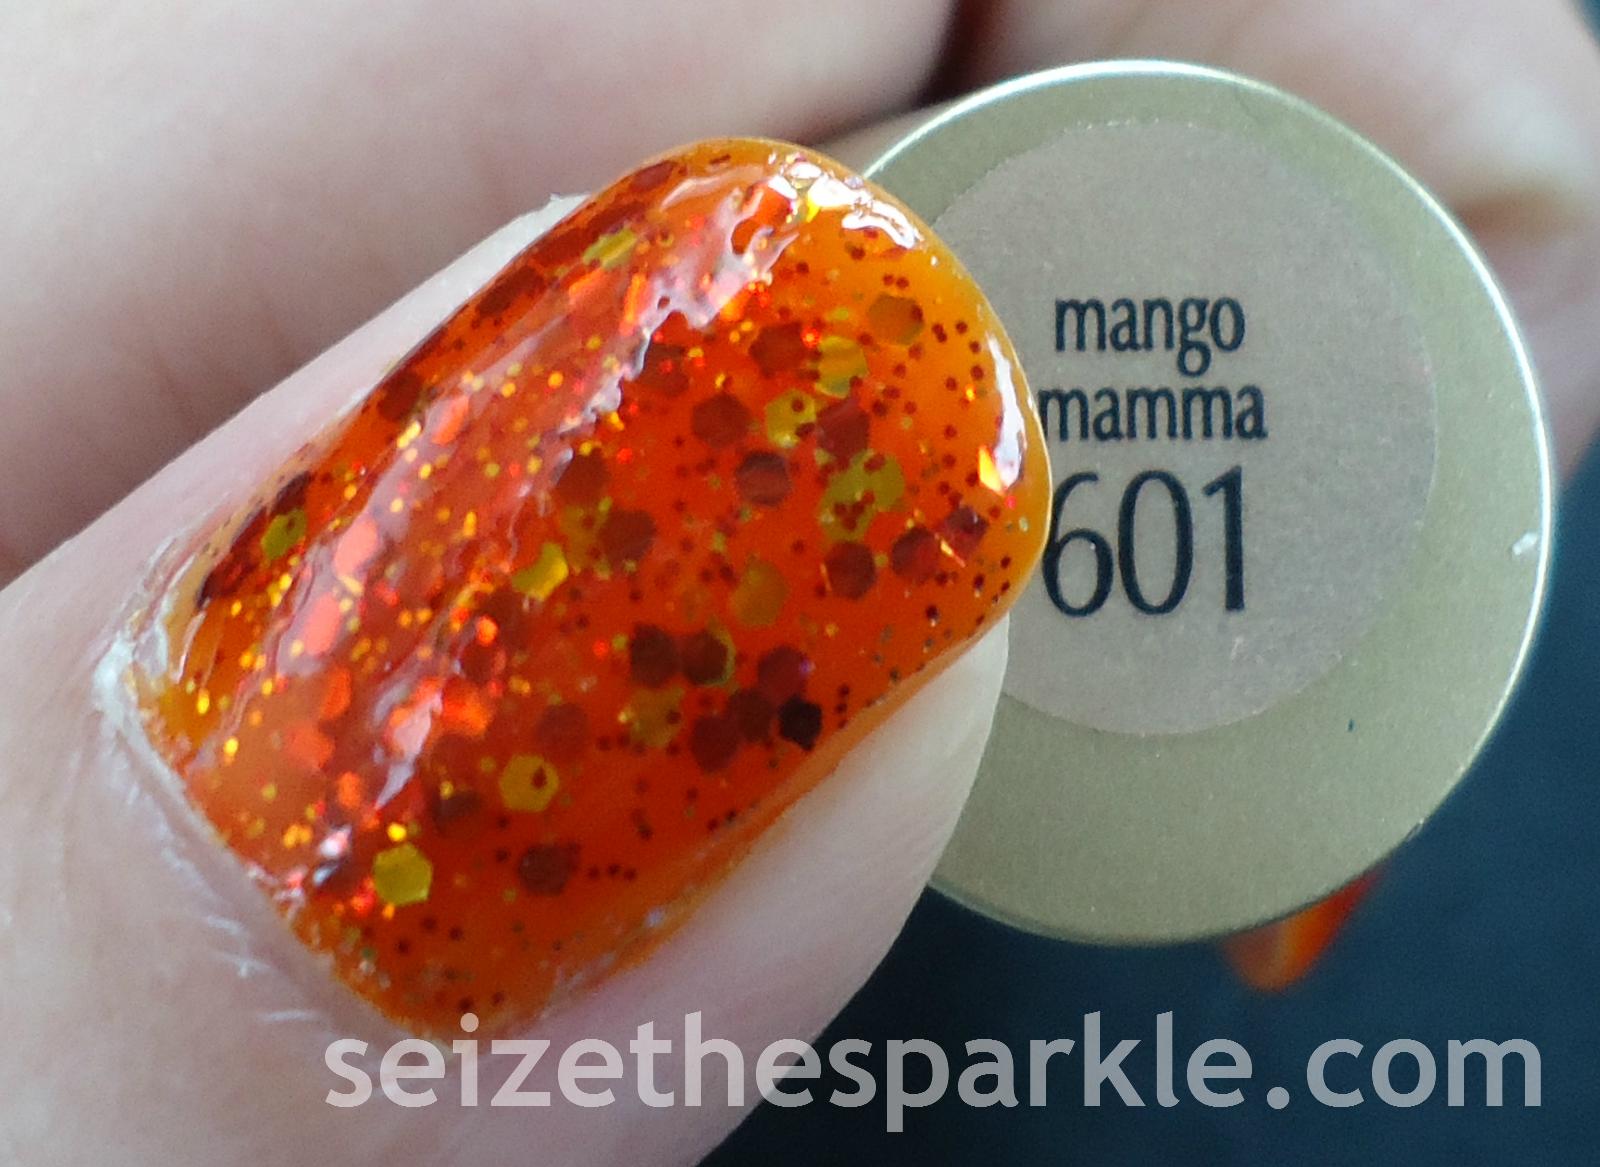 L'Oreal 601 Mango Mamma